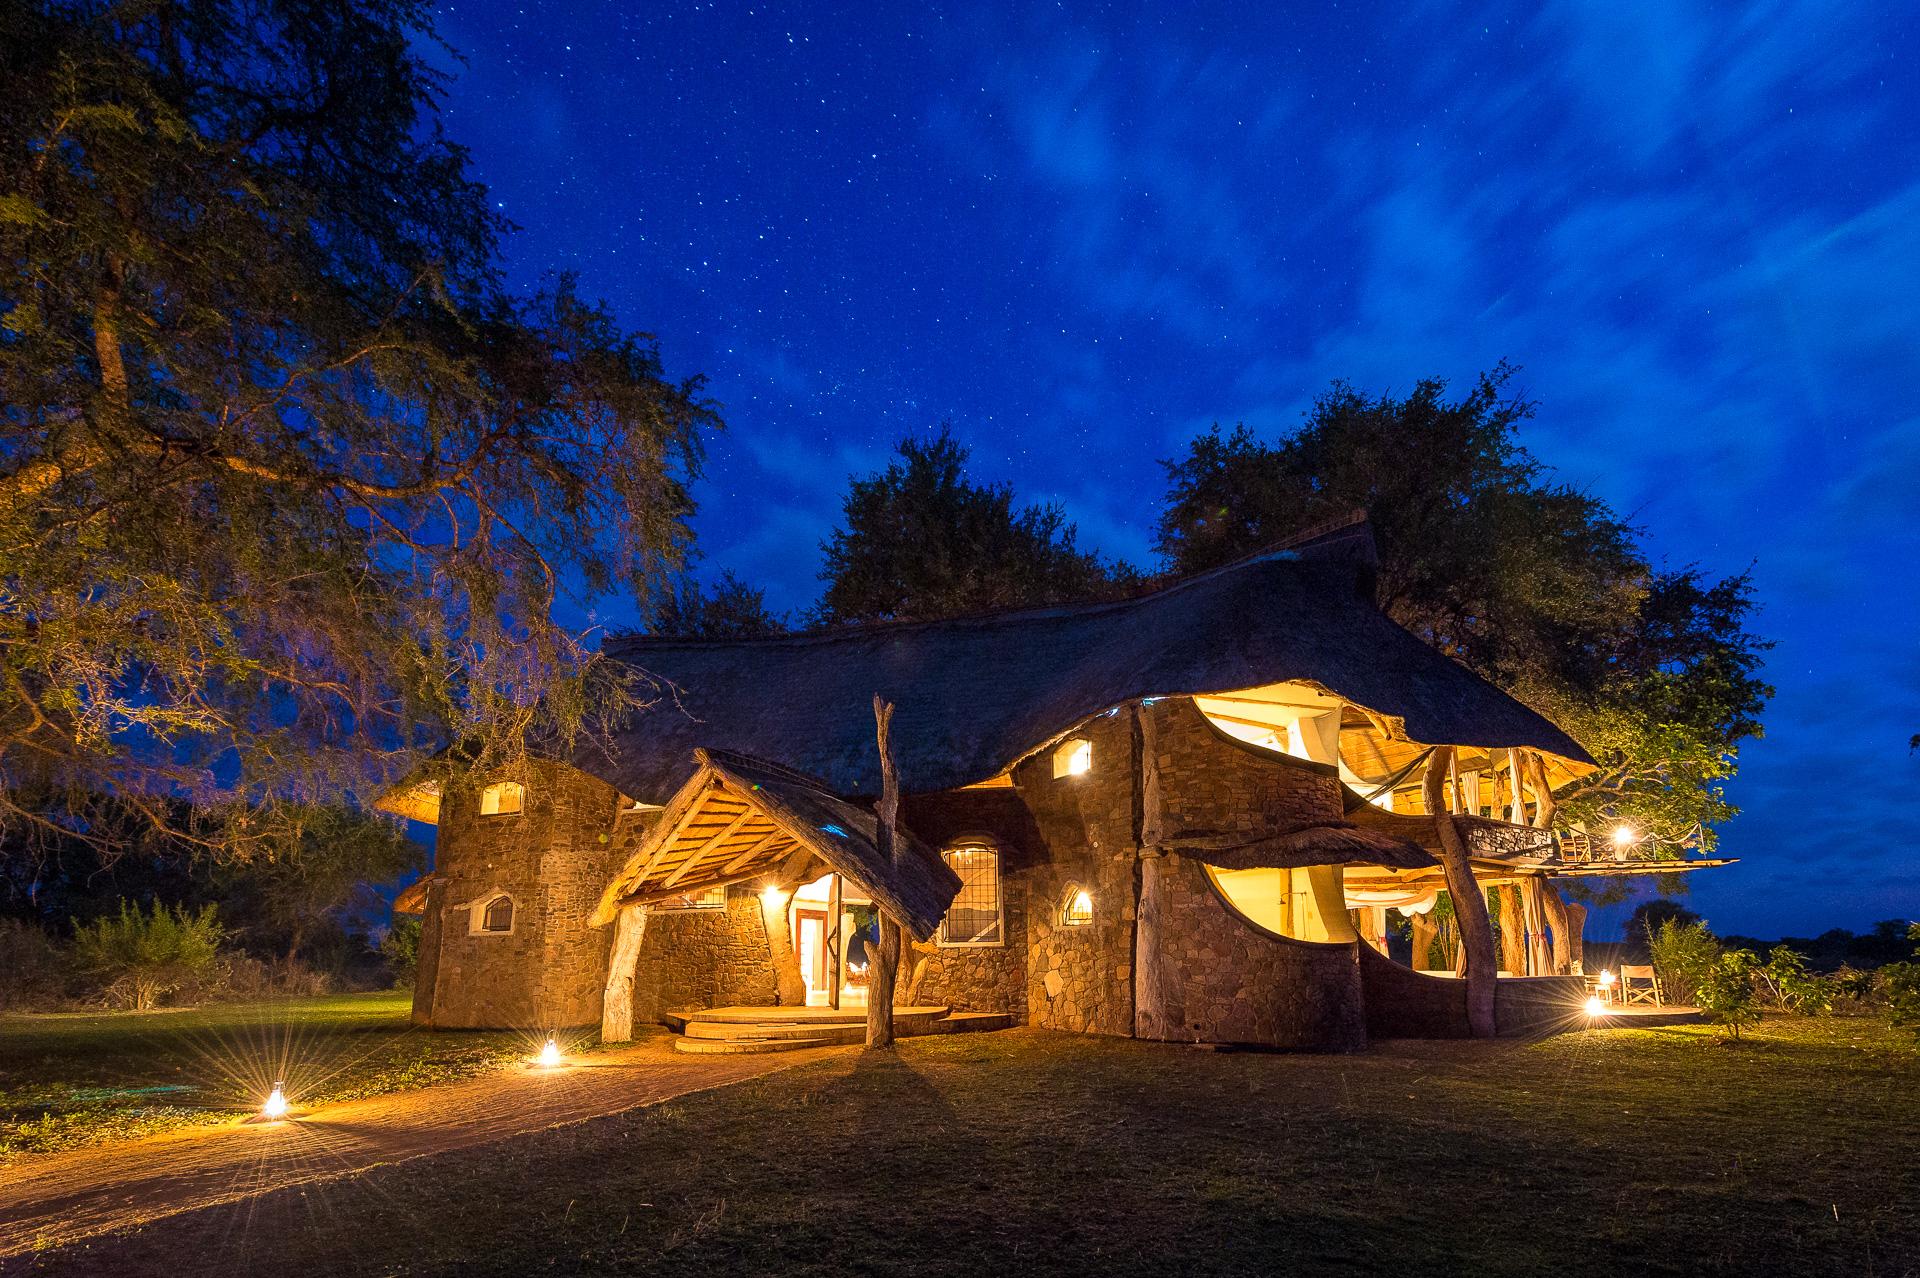 Luanga Safari House Zambia Exterior Night